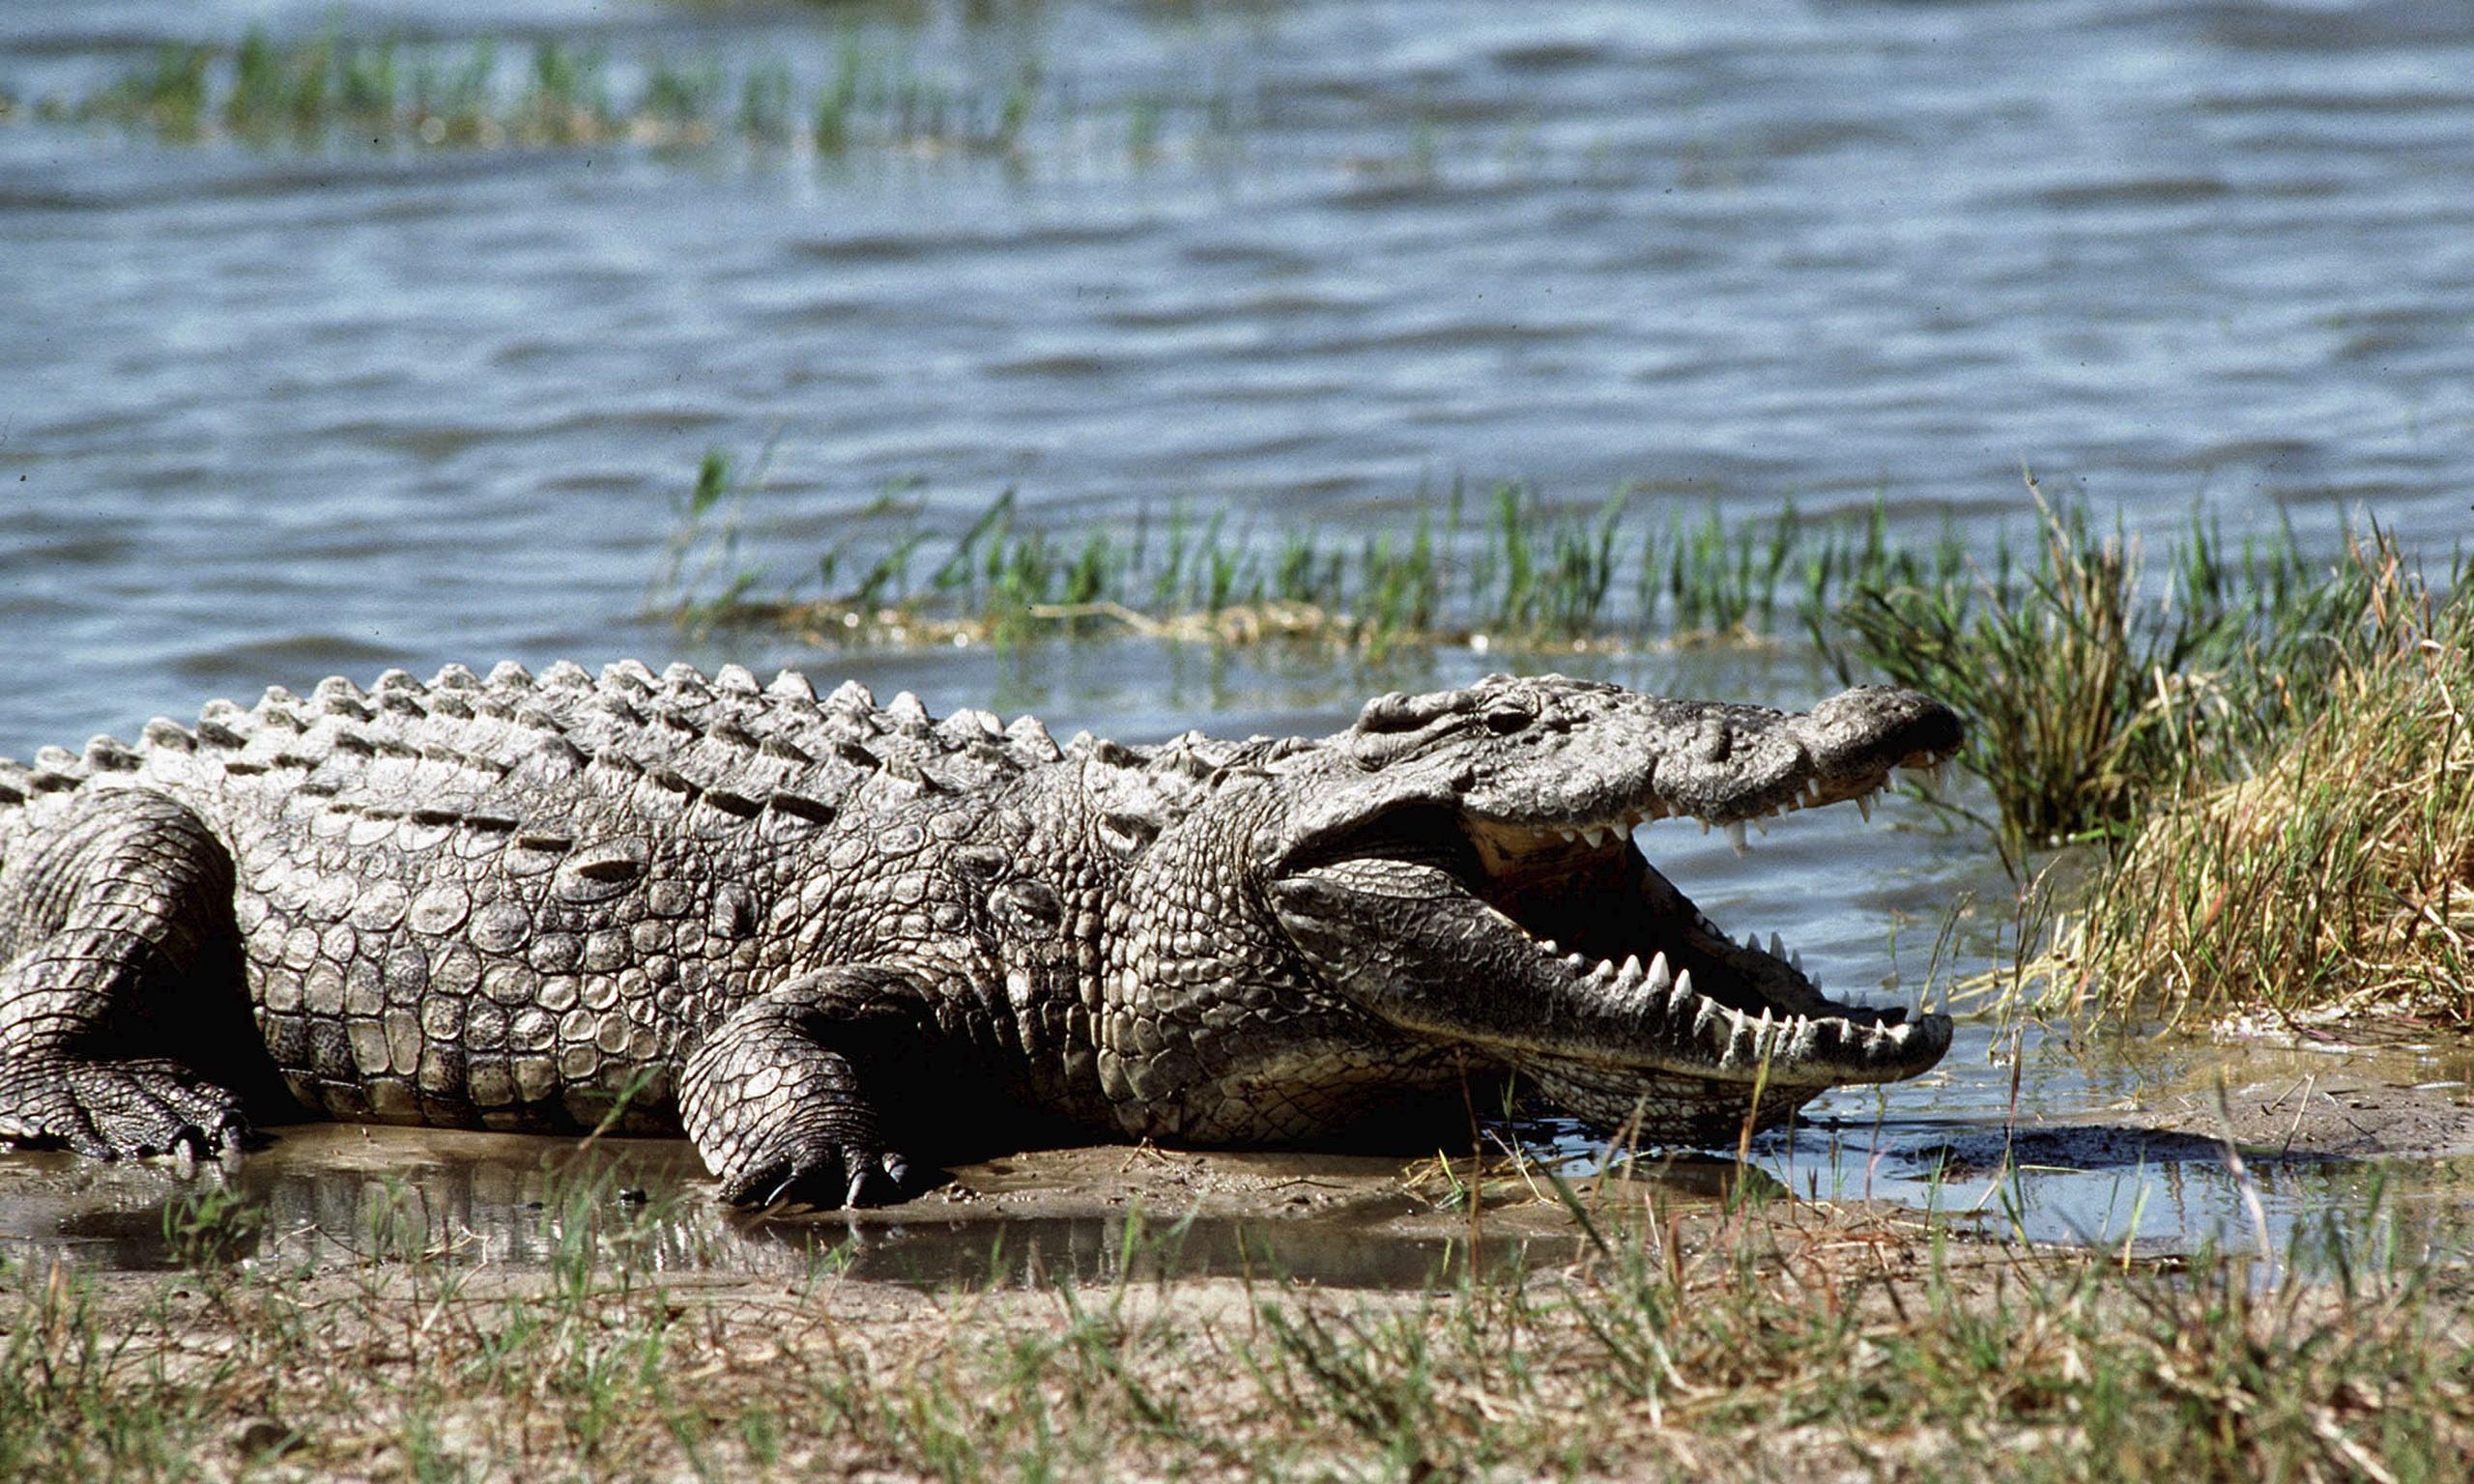 alligator wallpaper for home - photo #27